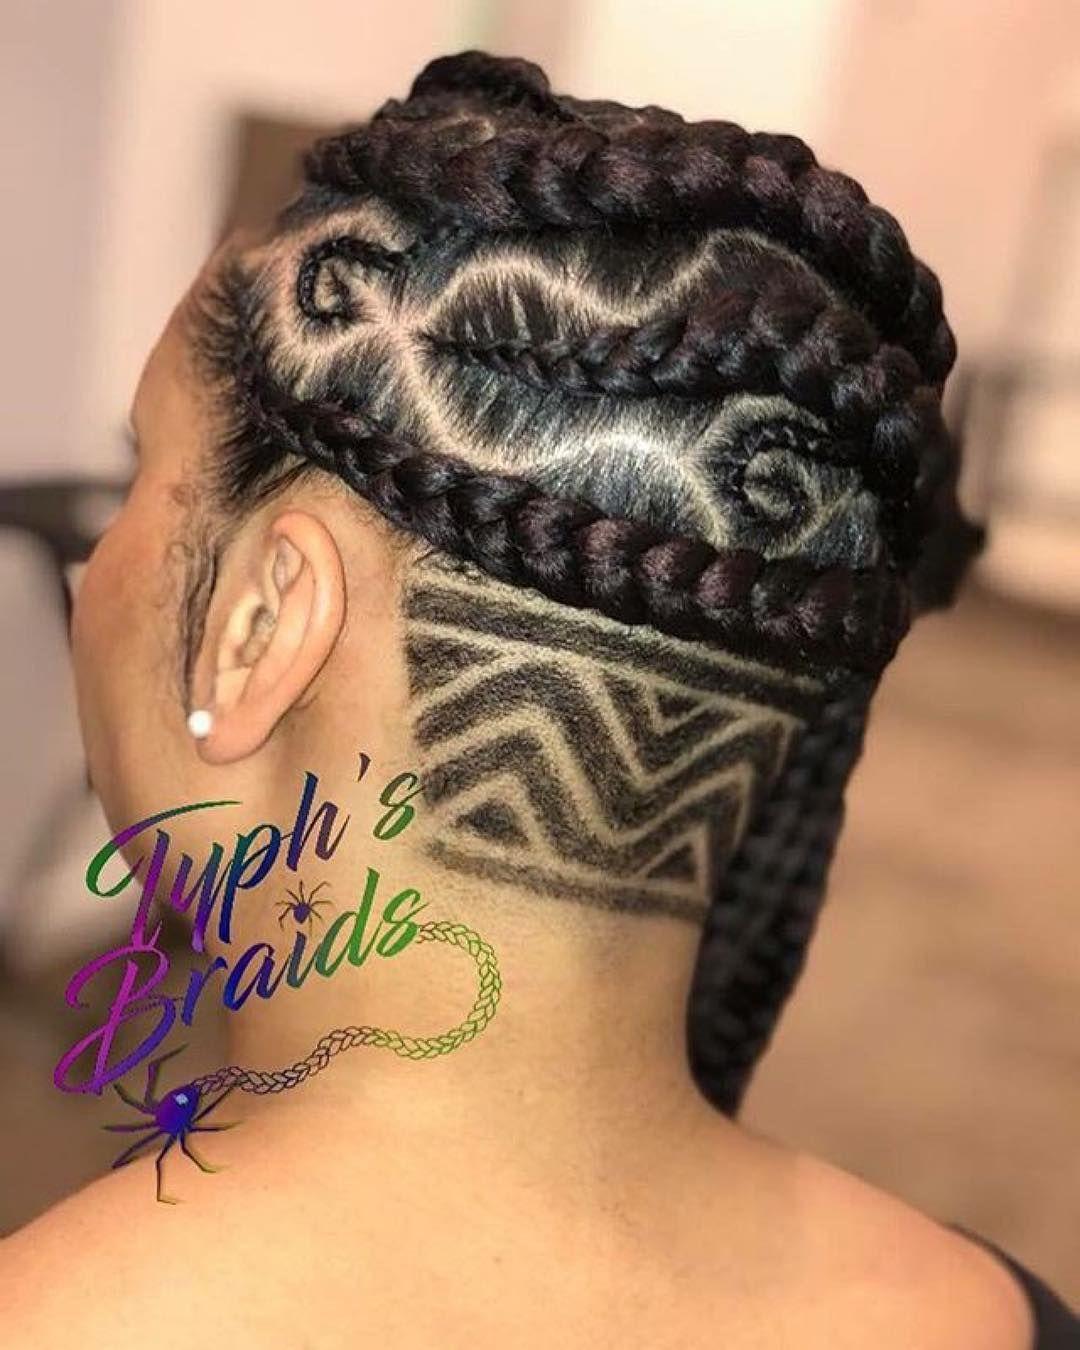 Hairnbeautydirectory on instagram uchairstylist typhsbraids